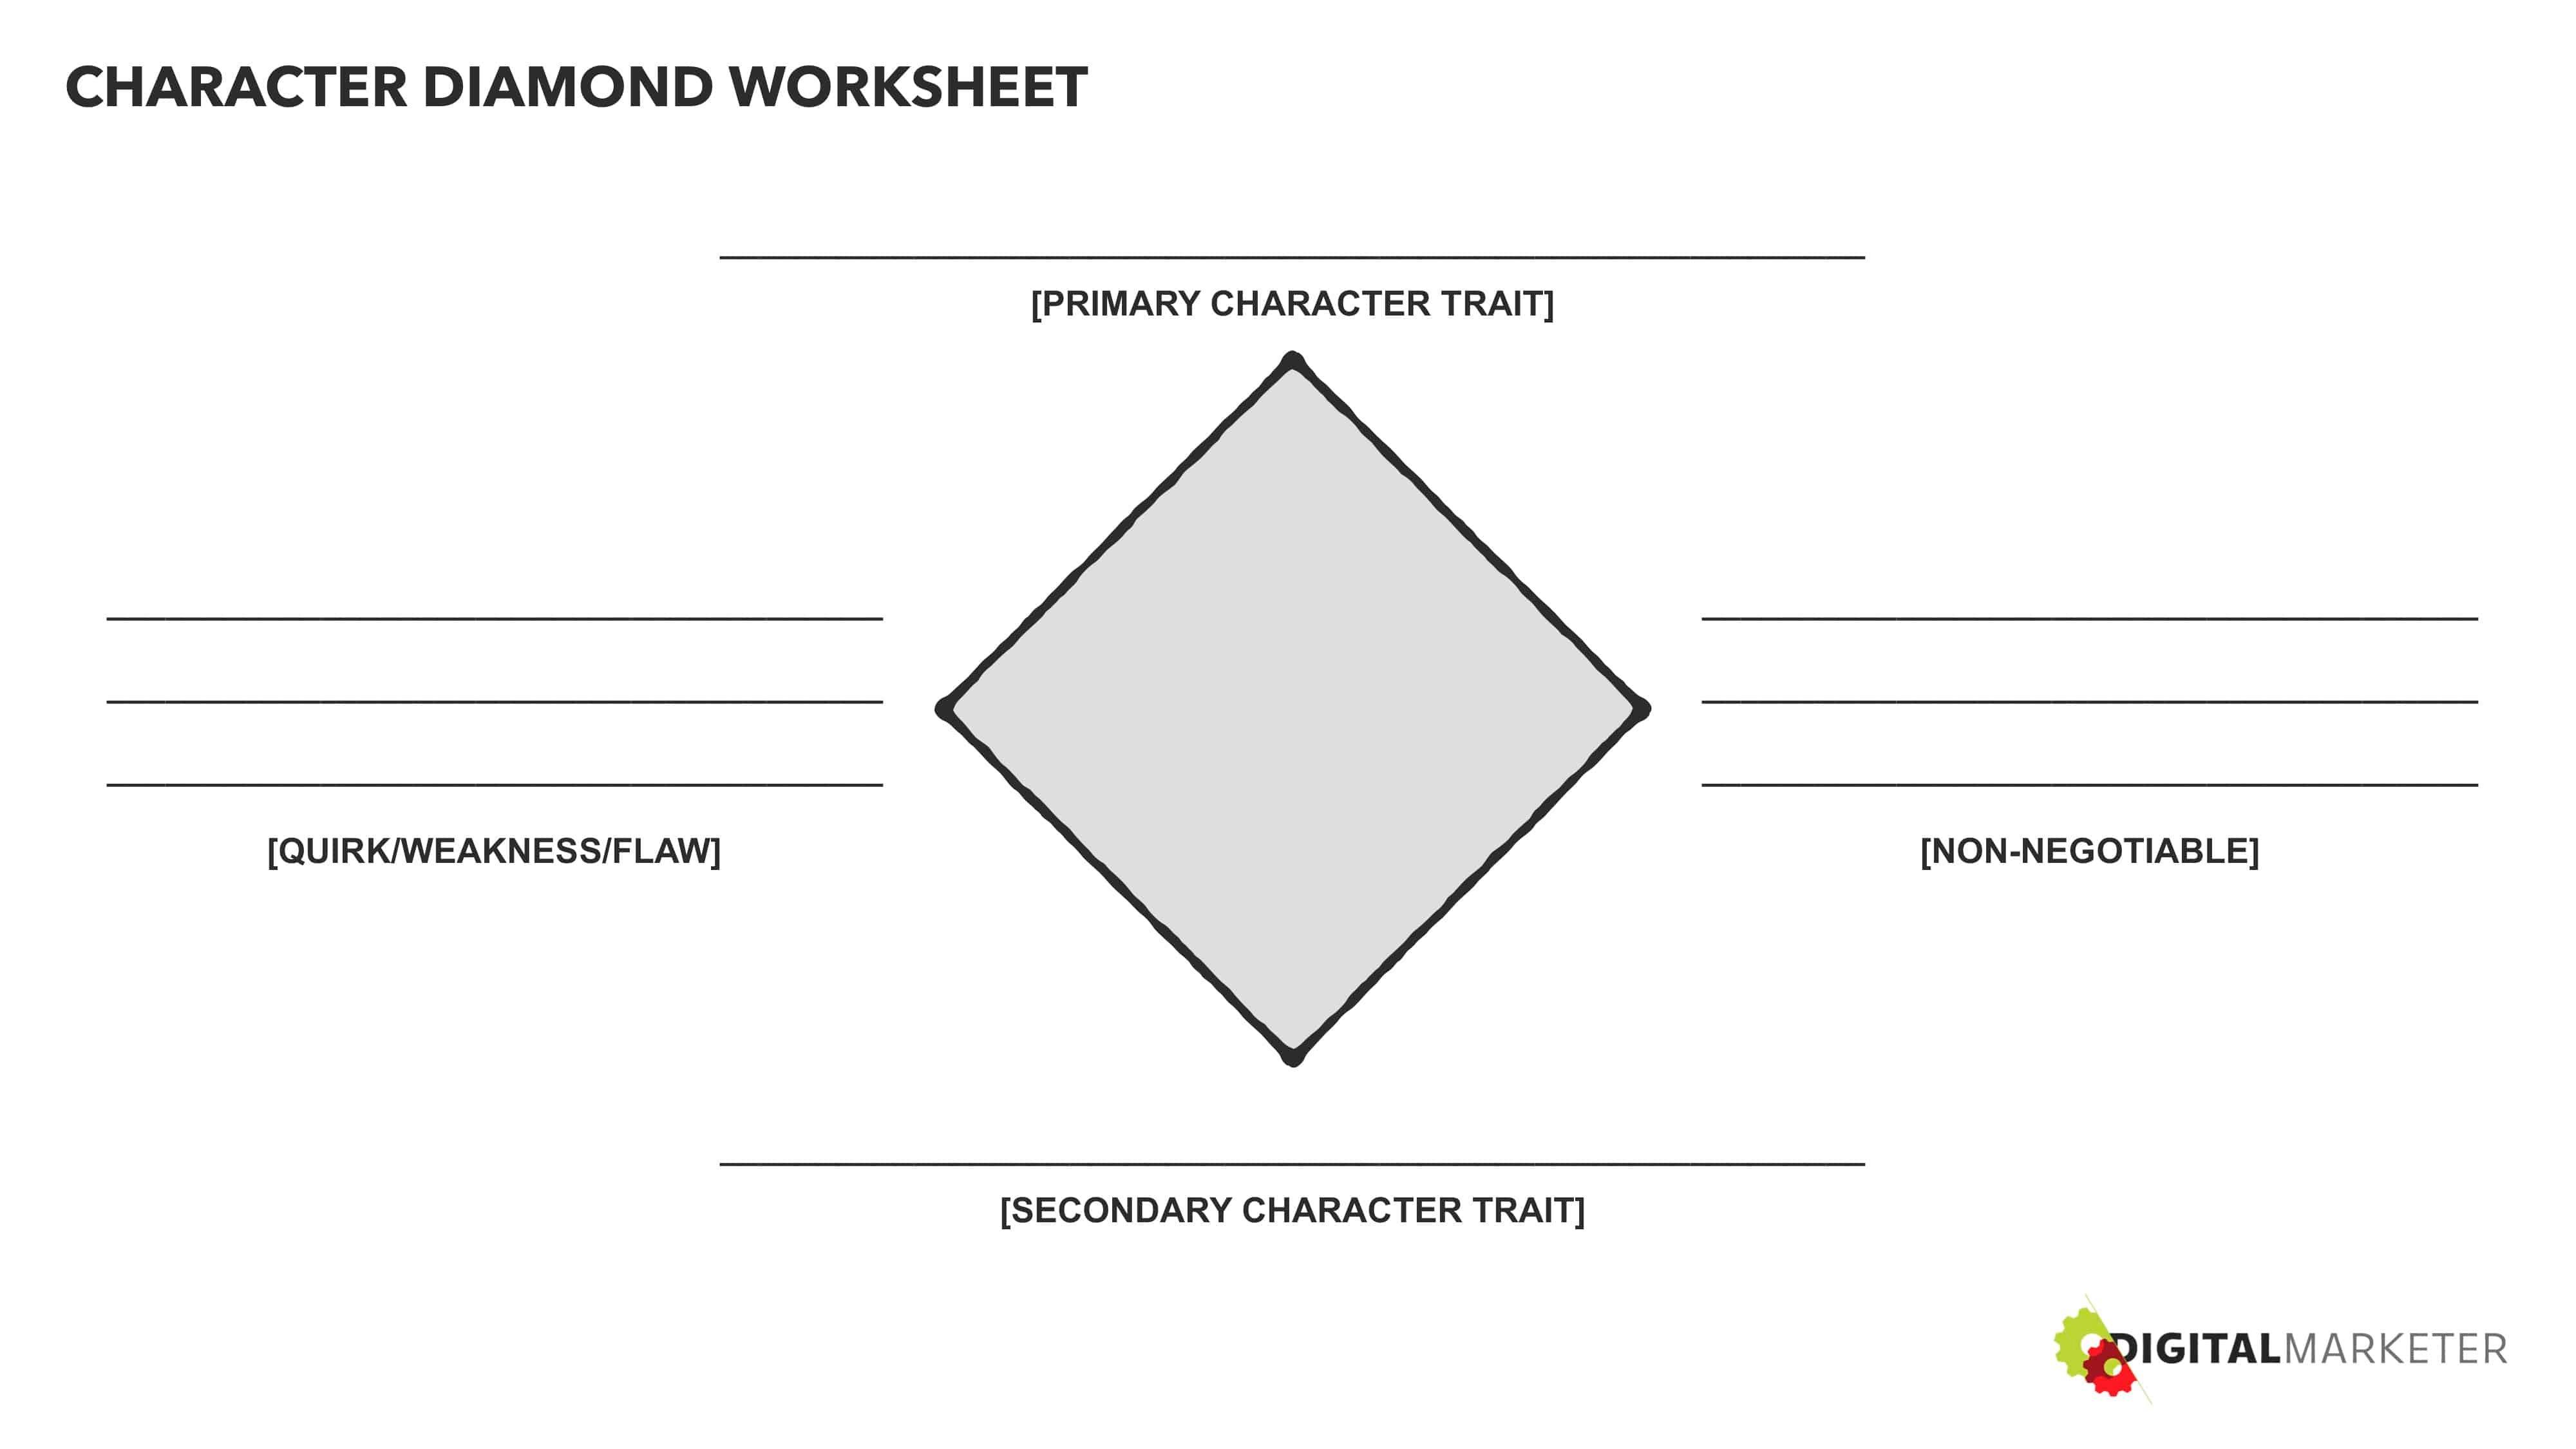 Character Diamond Worksheet